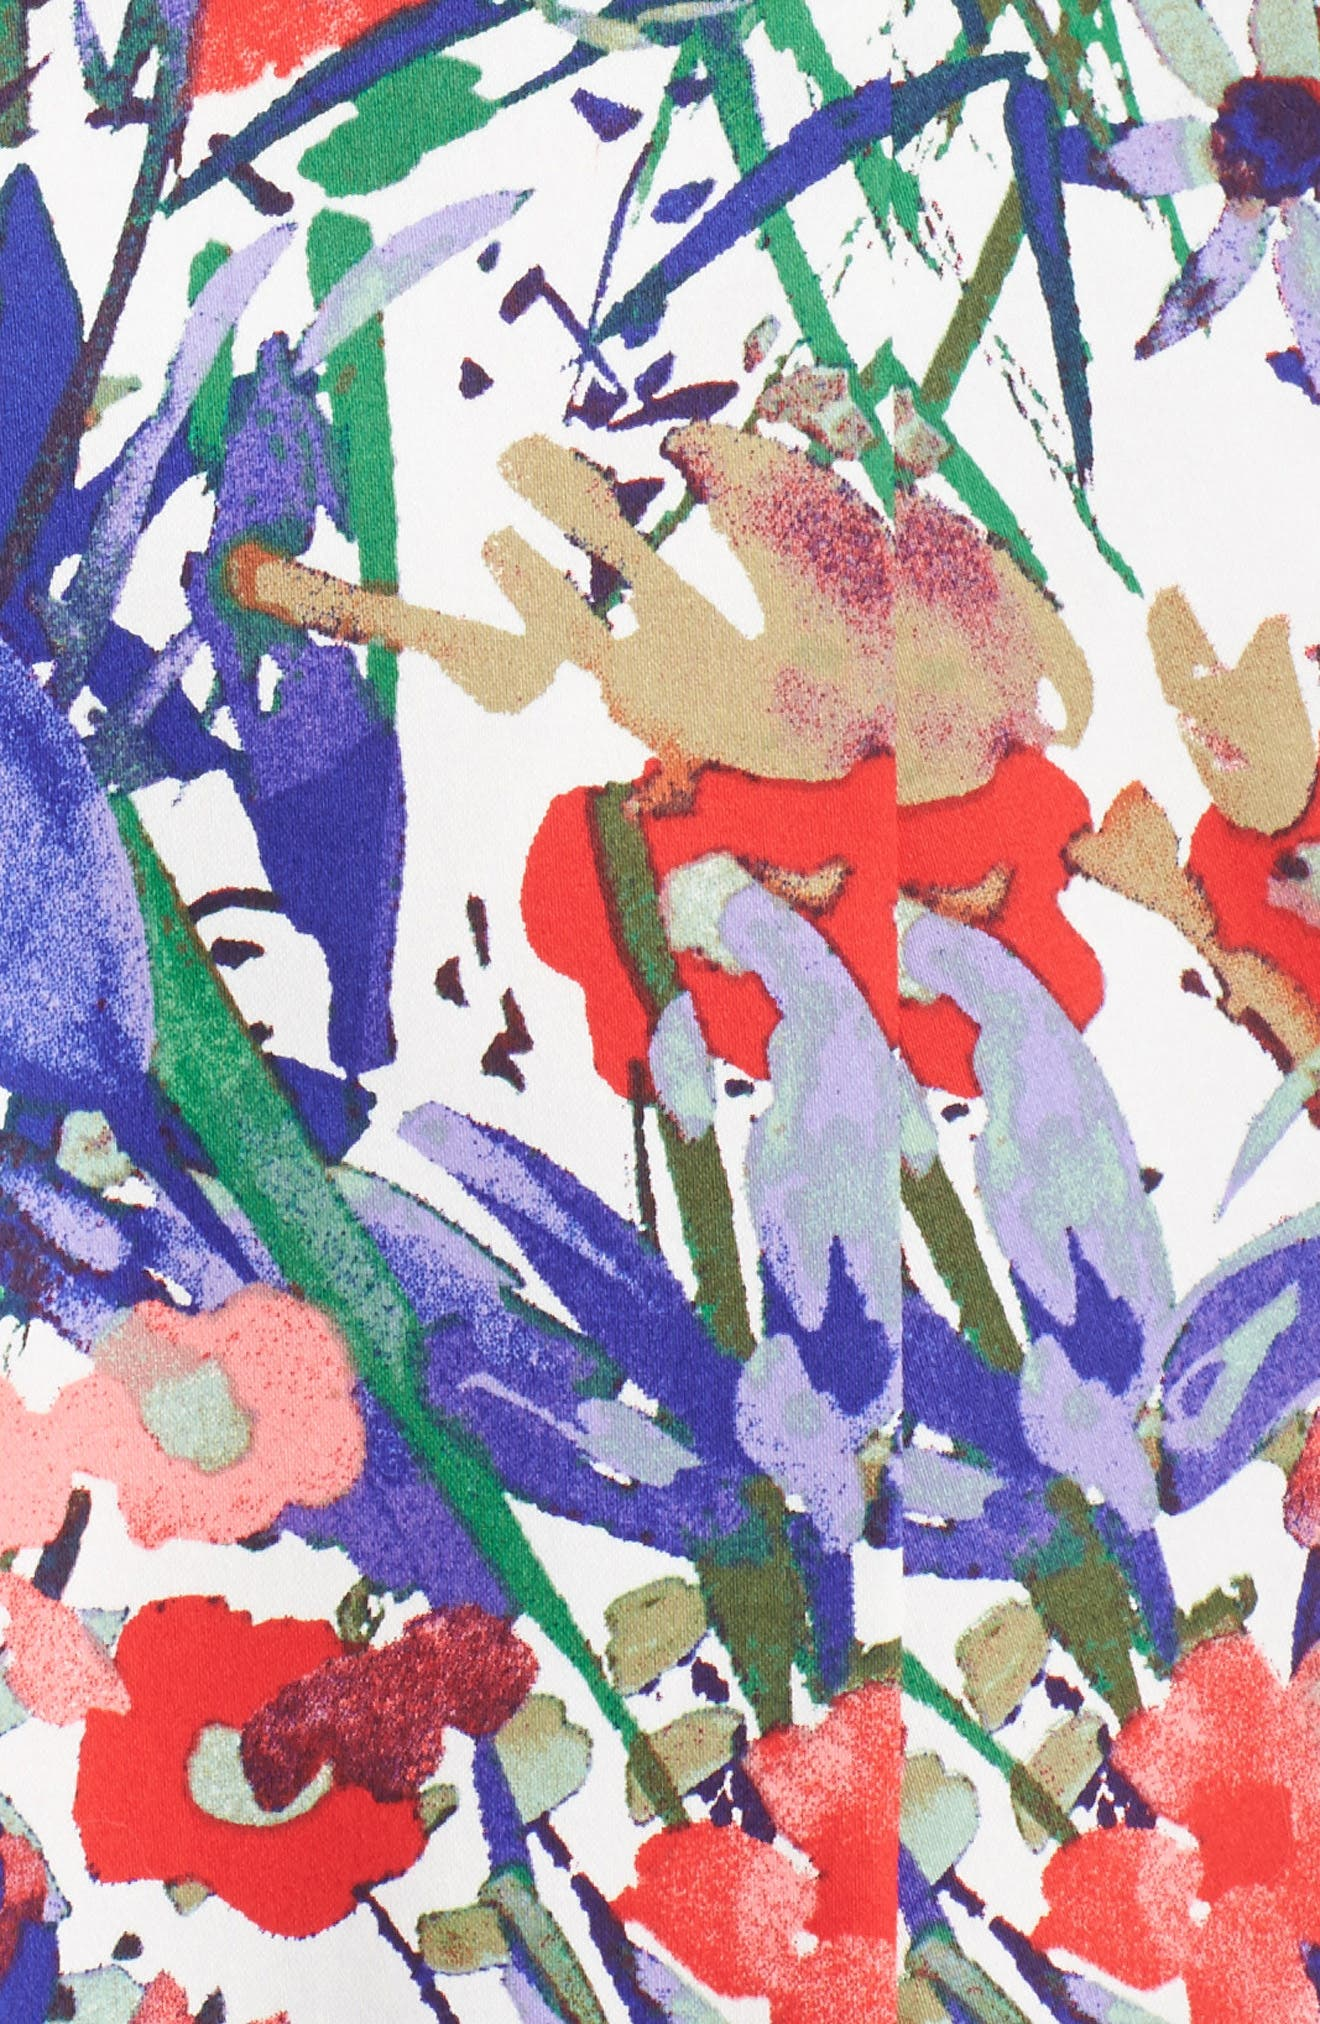 Cottage Garden Fit & Flare Dress,                             Alternate thumbnail 5, color,                             Soft White/ Coral/ Purple